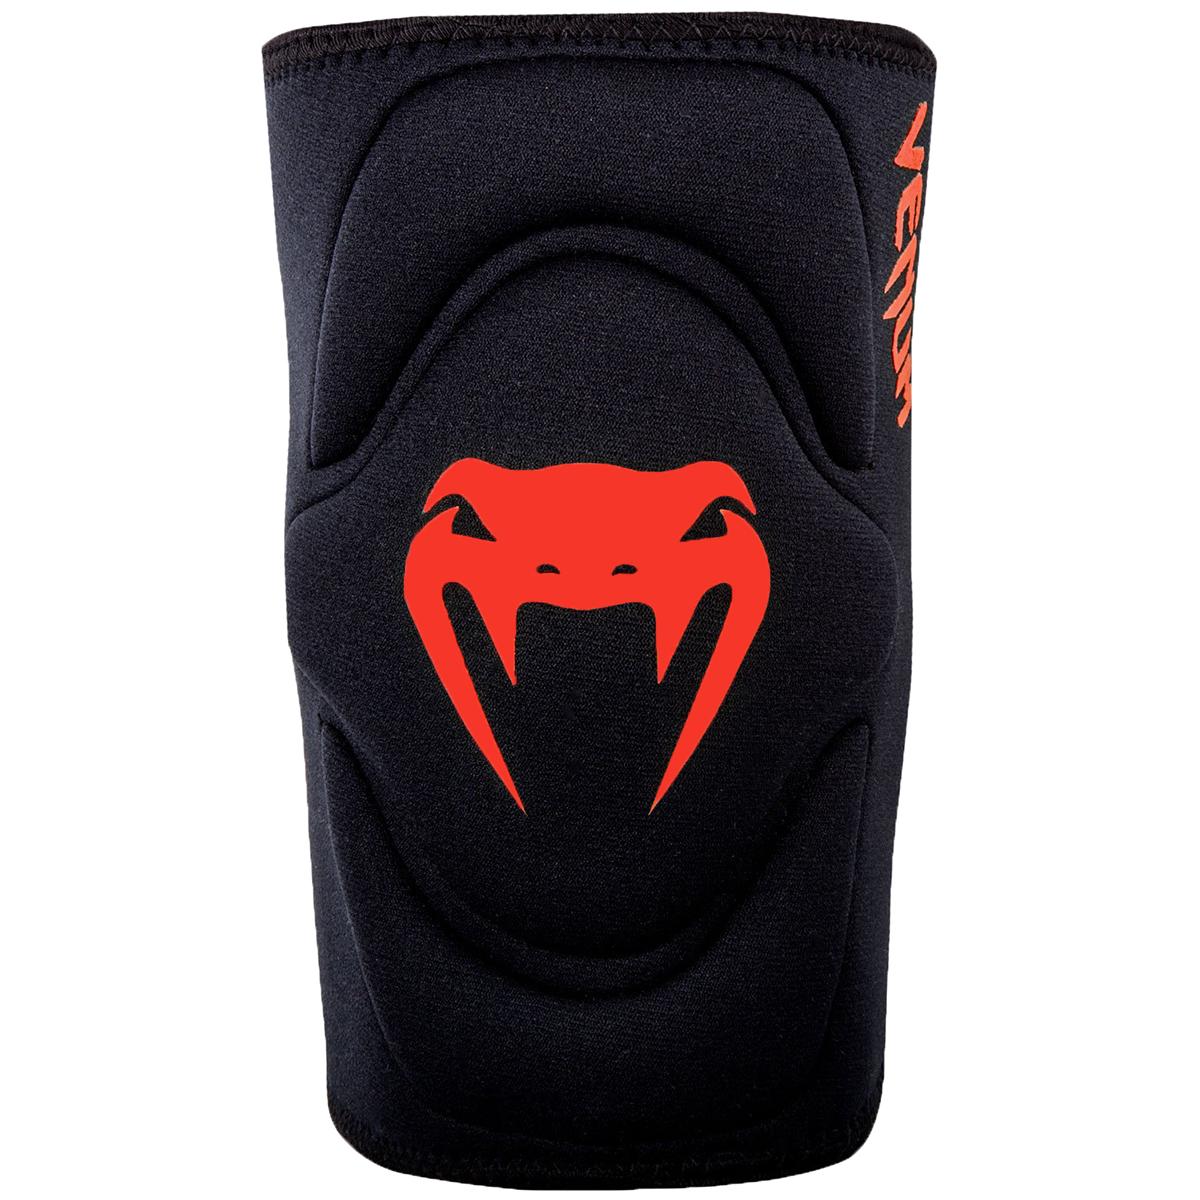 thumbnail 9 - Venum Kontact Gel Shock System Protective MMA Training Knee Pads